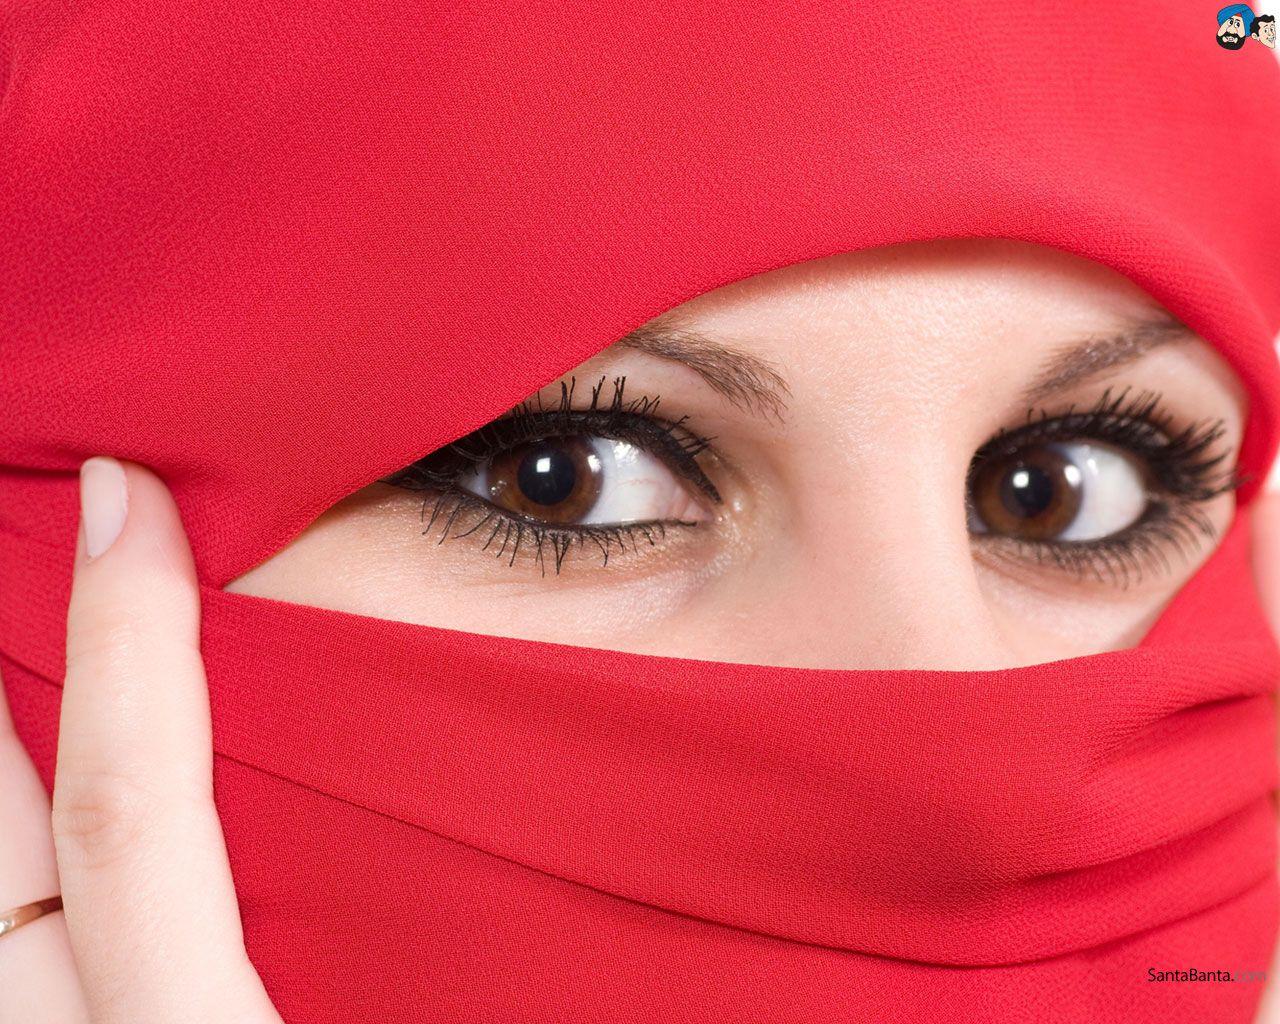 arab women in hijab wallpaper 20 art board 2014 ideas pinterest. Black Bedroom Furniture Sets. Home Design Ideas